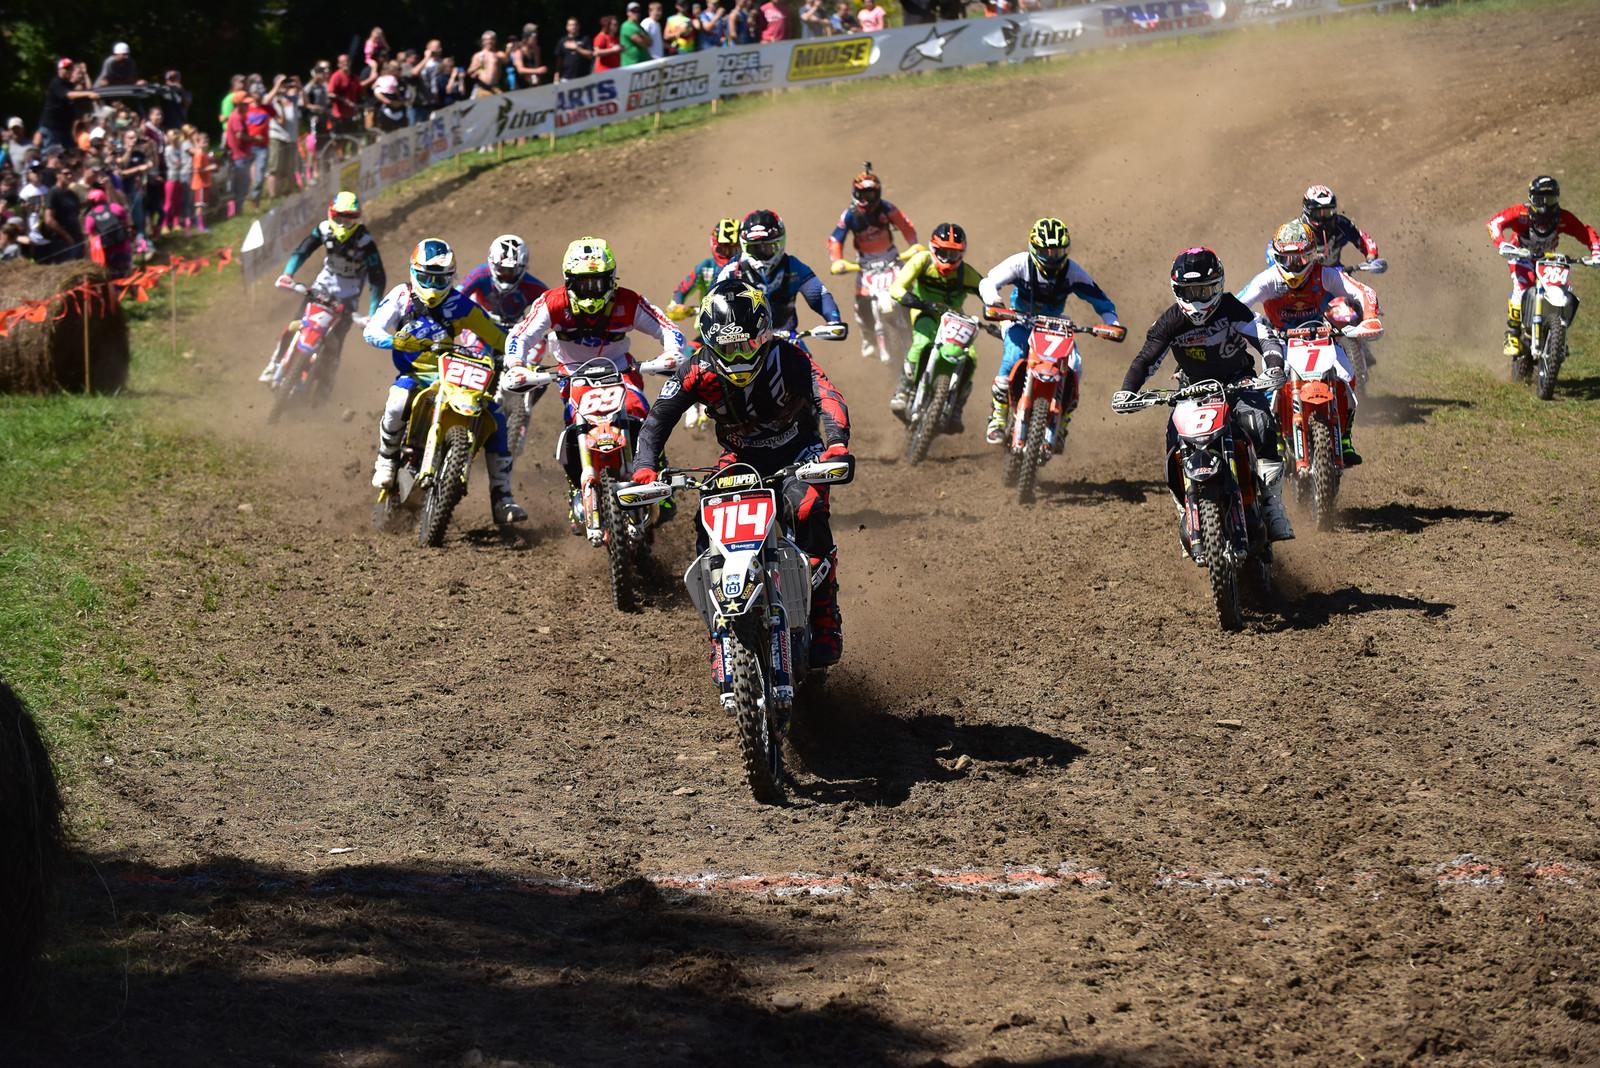 Josh Strang - Unadilla GNCC - Motocross Pictures - Vital MX